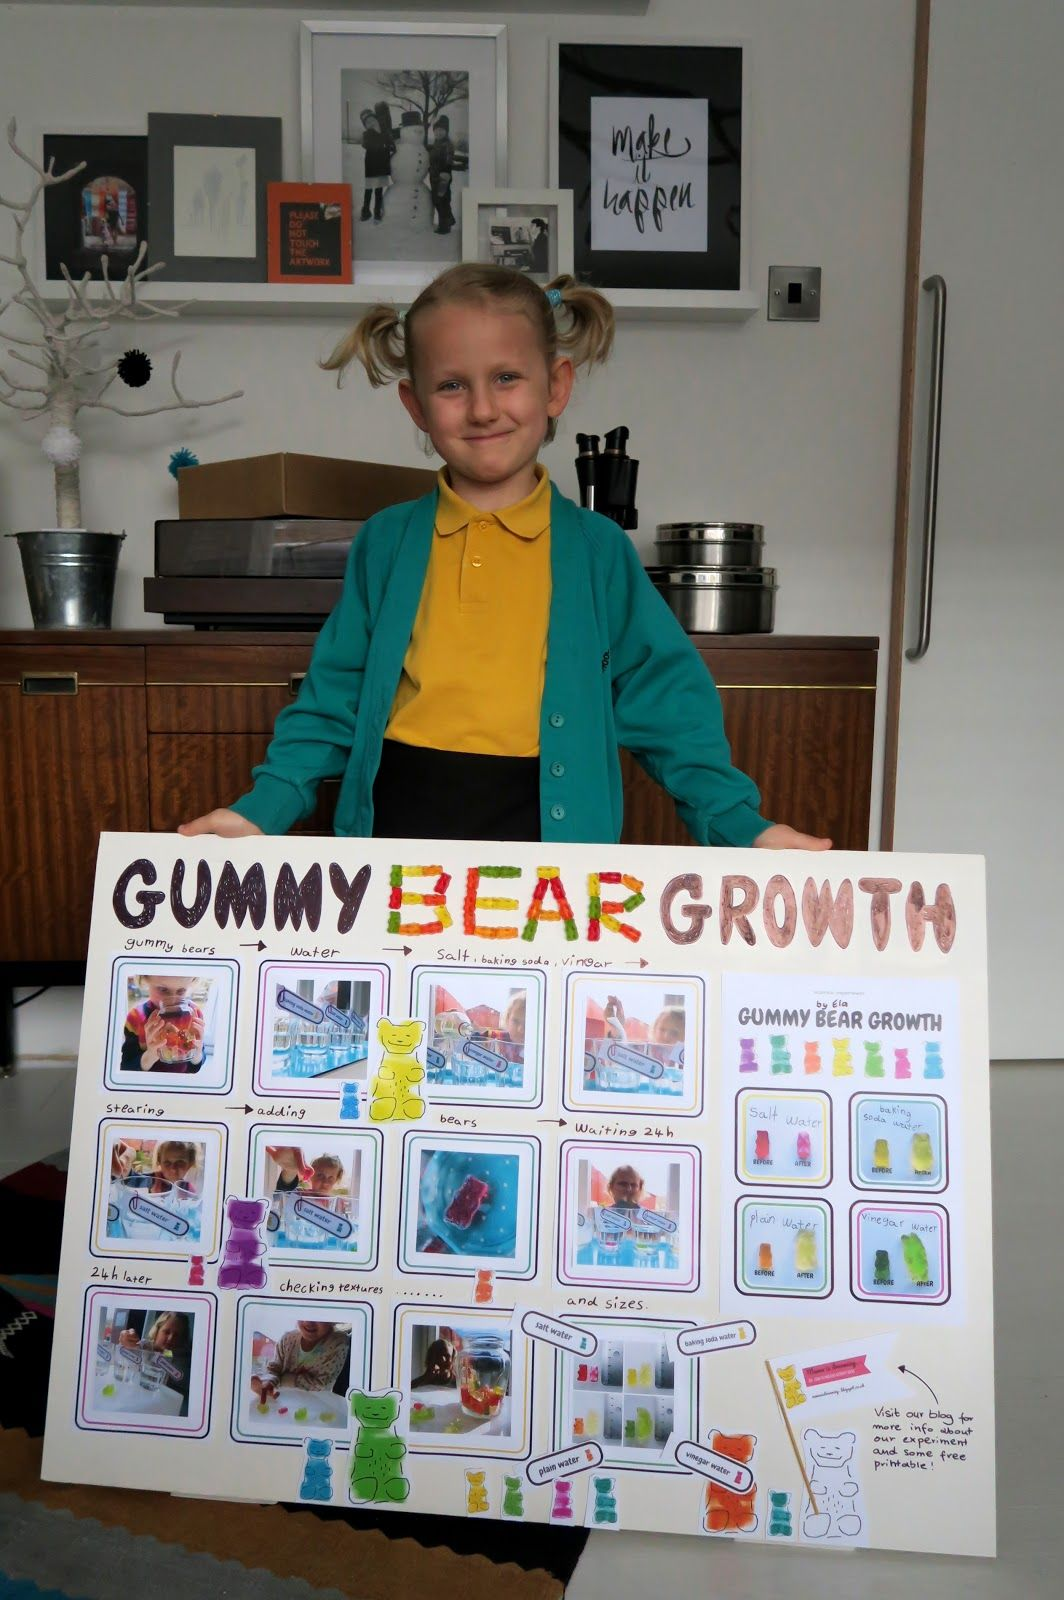 Gummy bear growth + free printable   mamaisdreaming ...